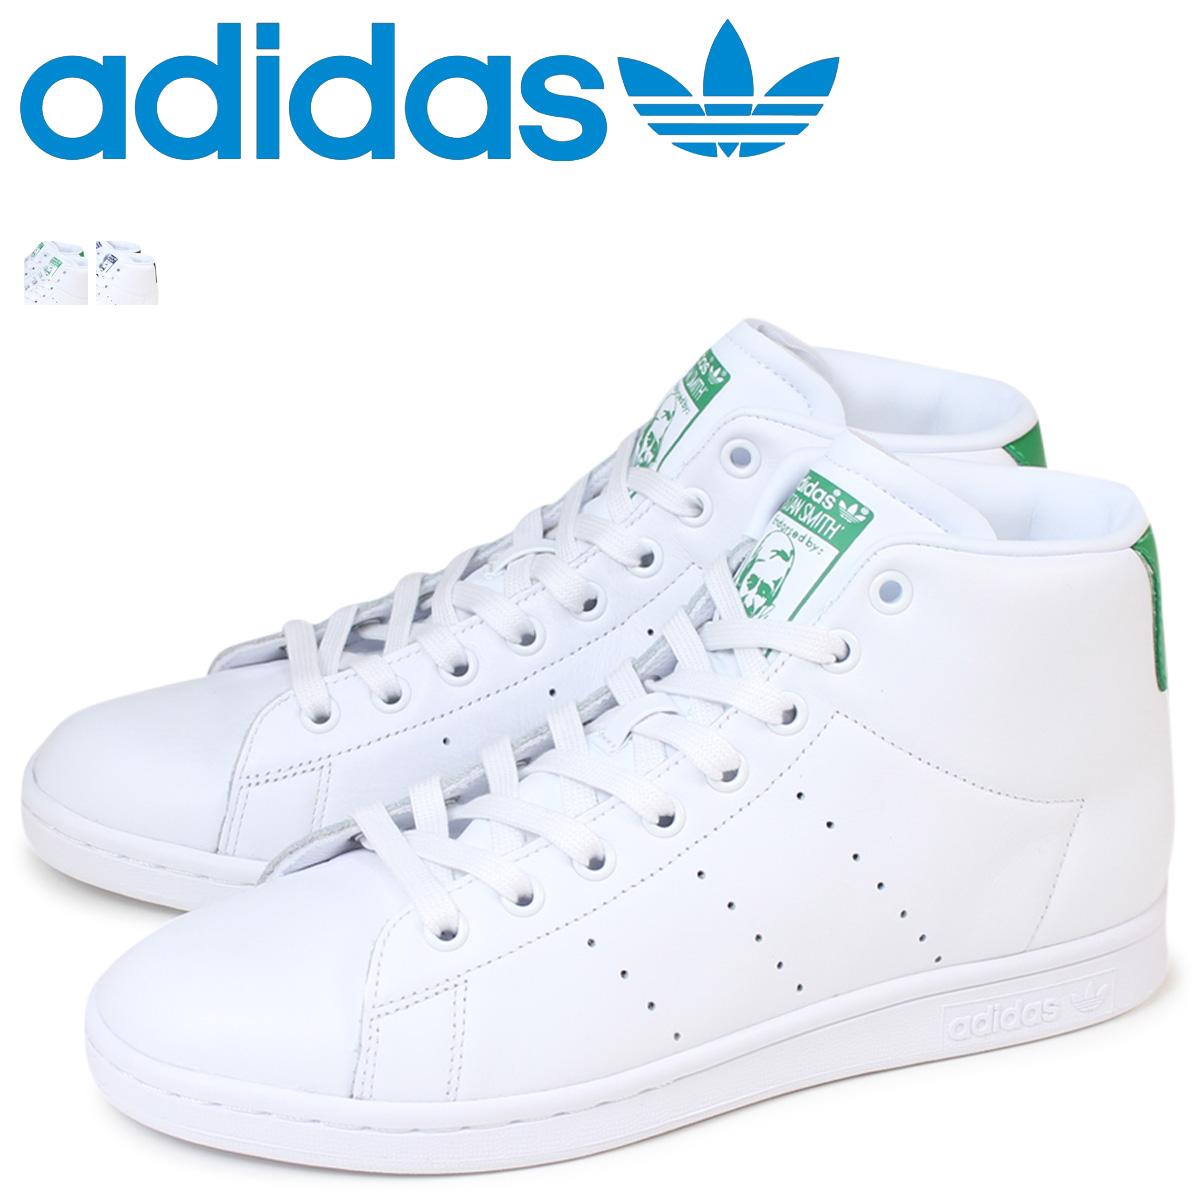 Adidas originals adidas Originals Women\u0027s STAN SMITH GS sneakers Stan Smith  girls leather kids \u0027 Junior